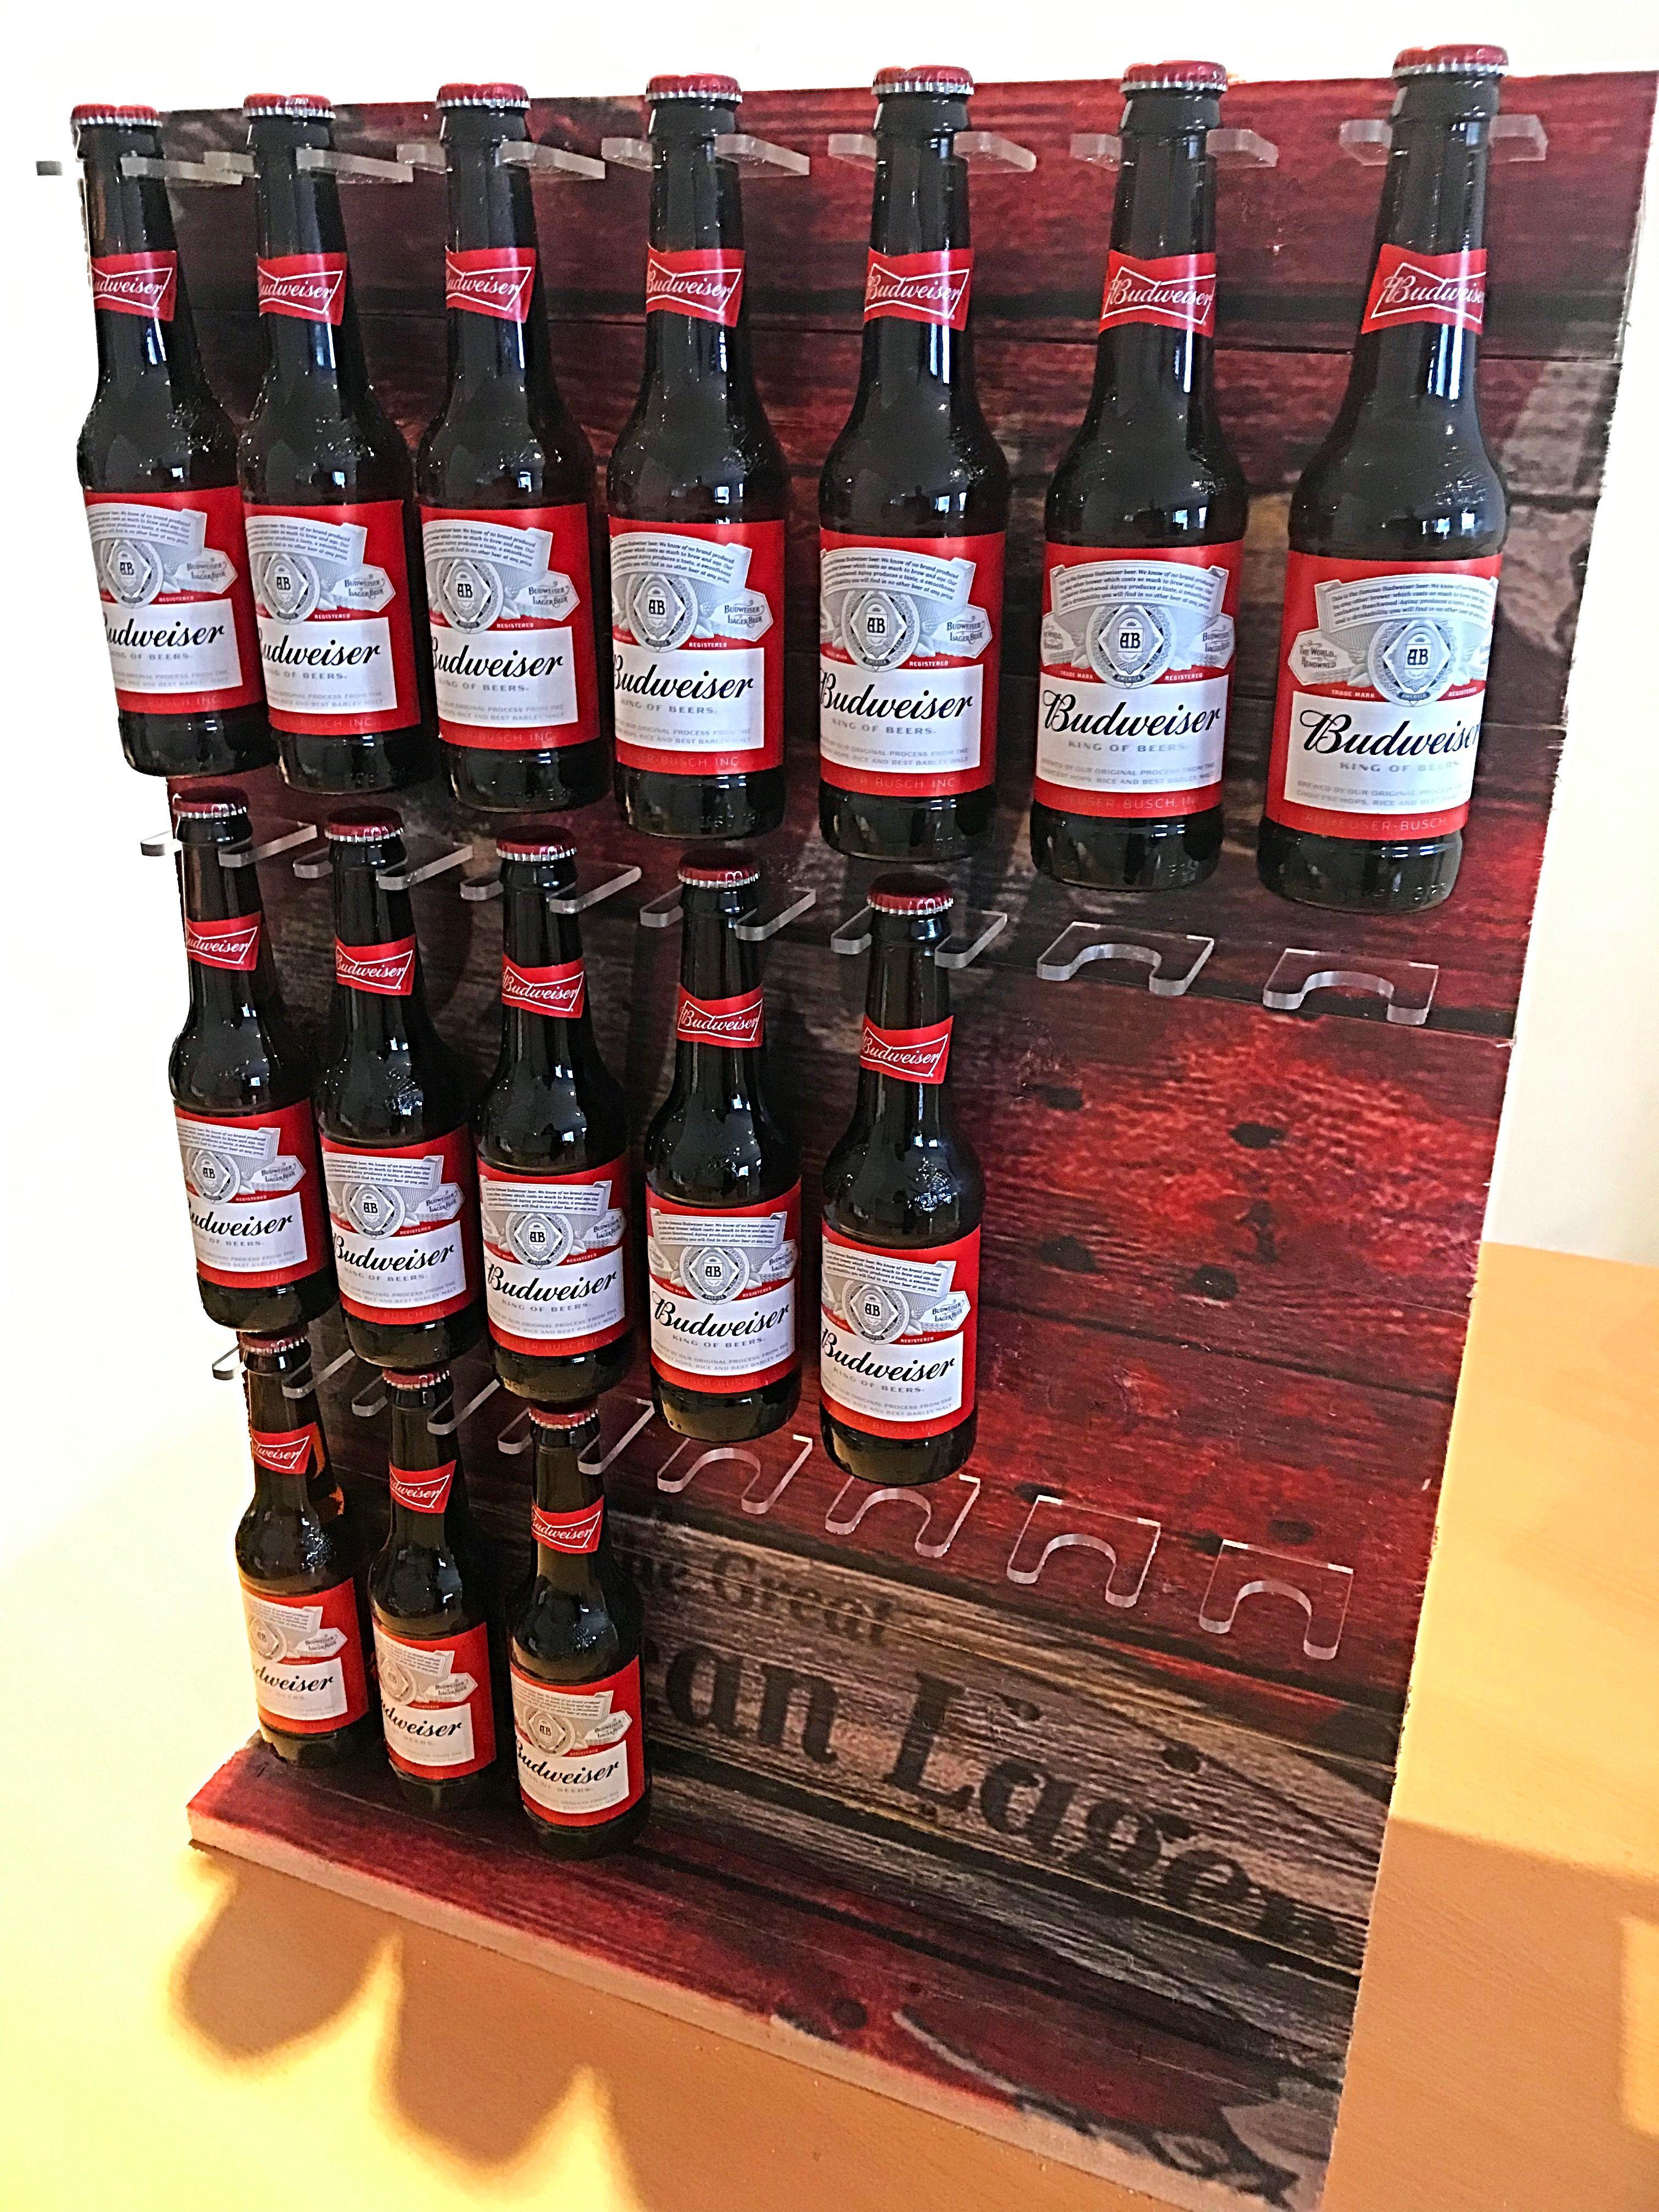 Beer Wall Hire For Weddings Birthdays Christening Corporate North West Beer Wall Beer Wall Wedding Beer